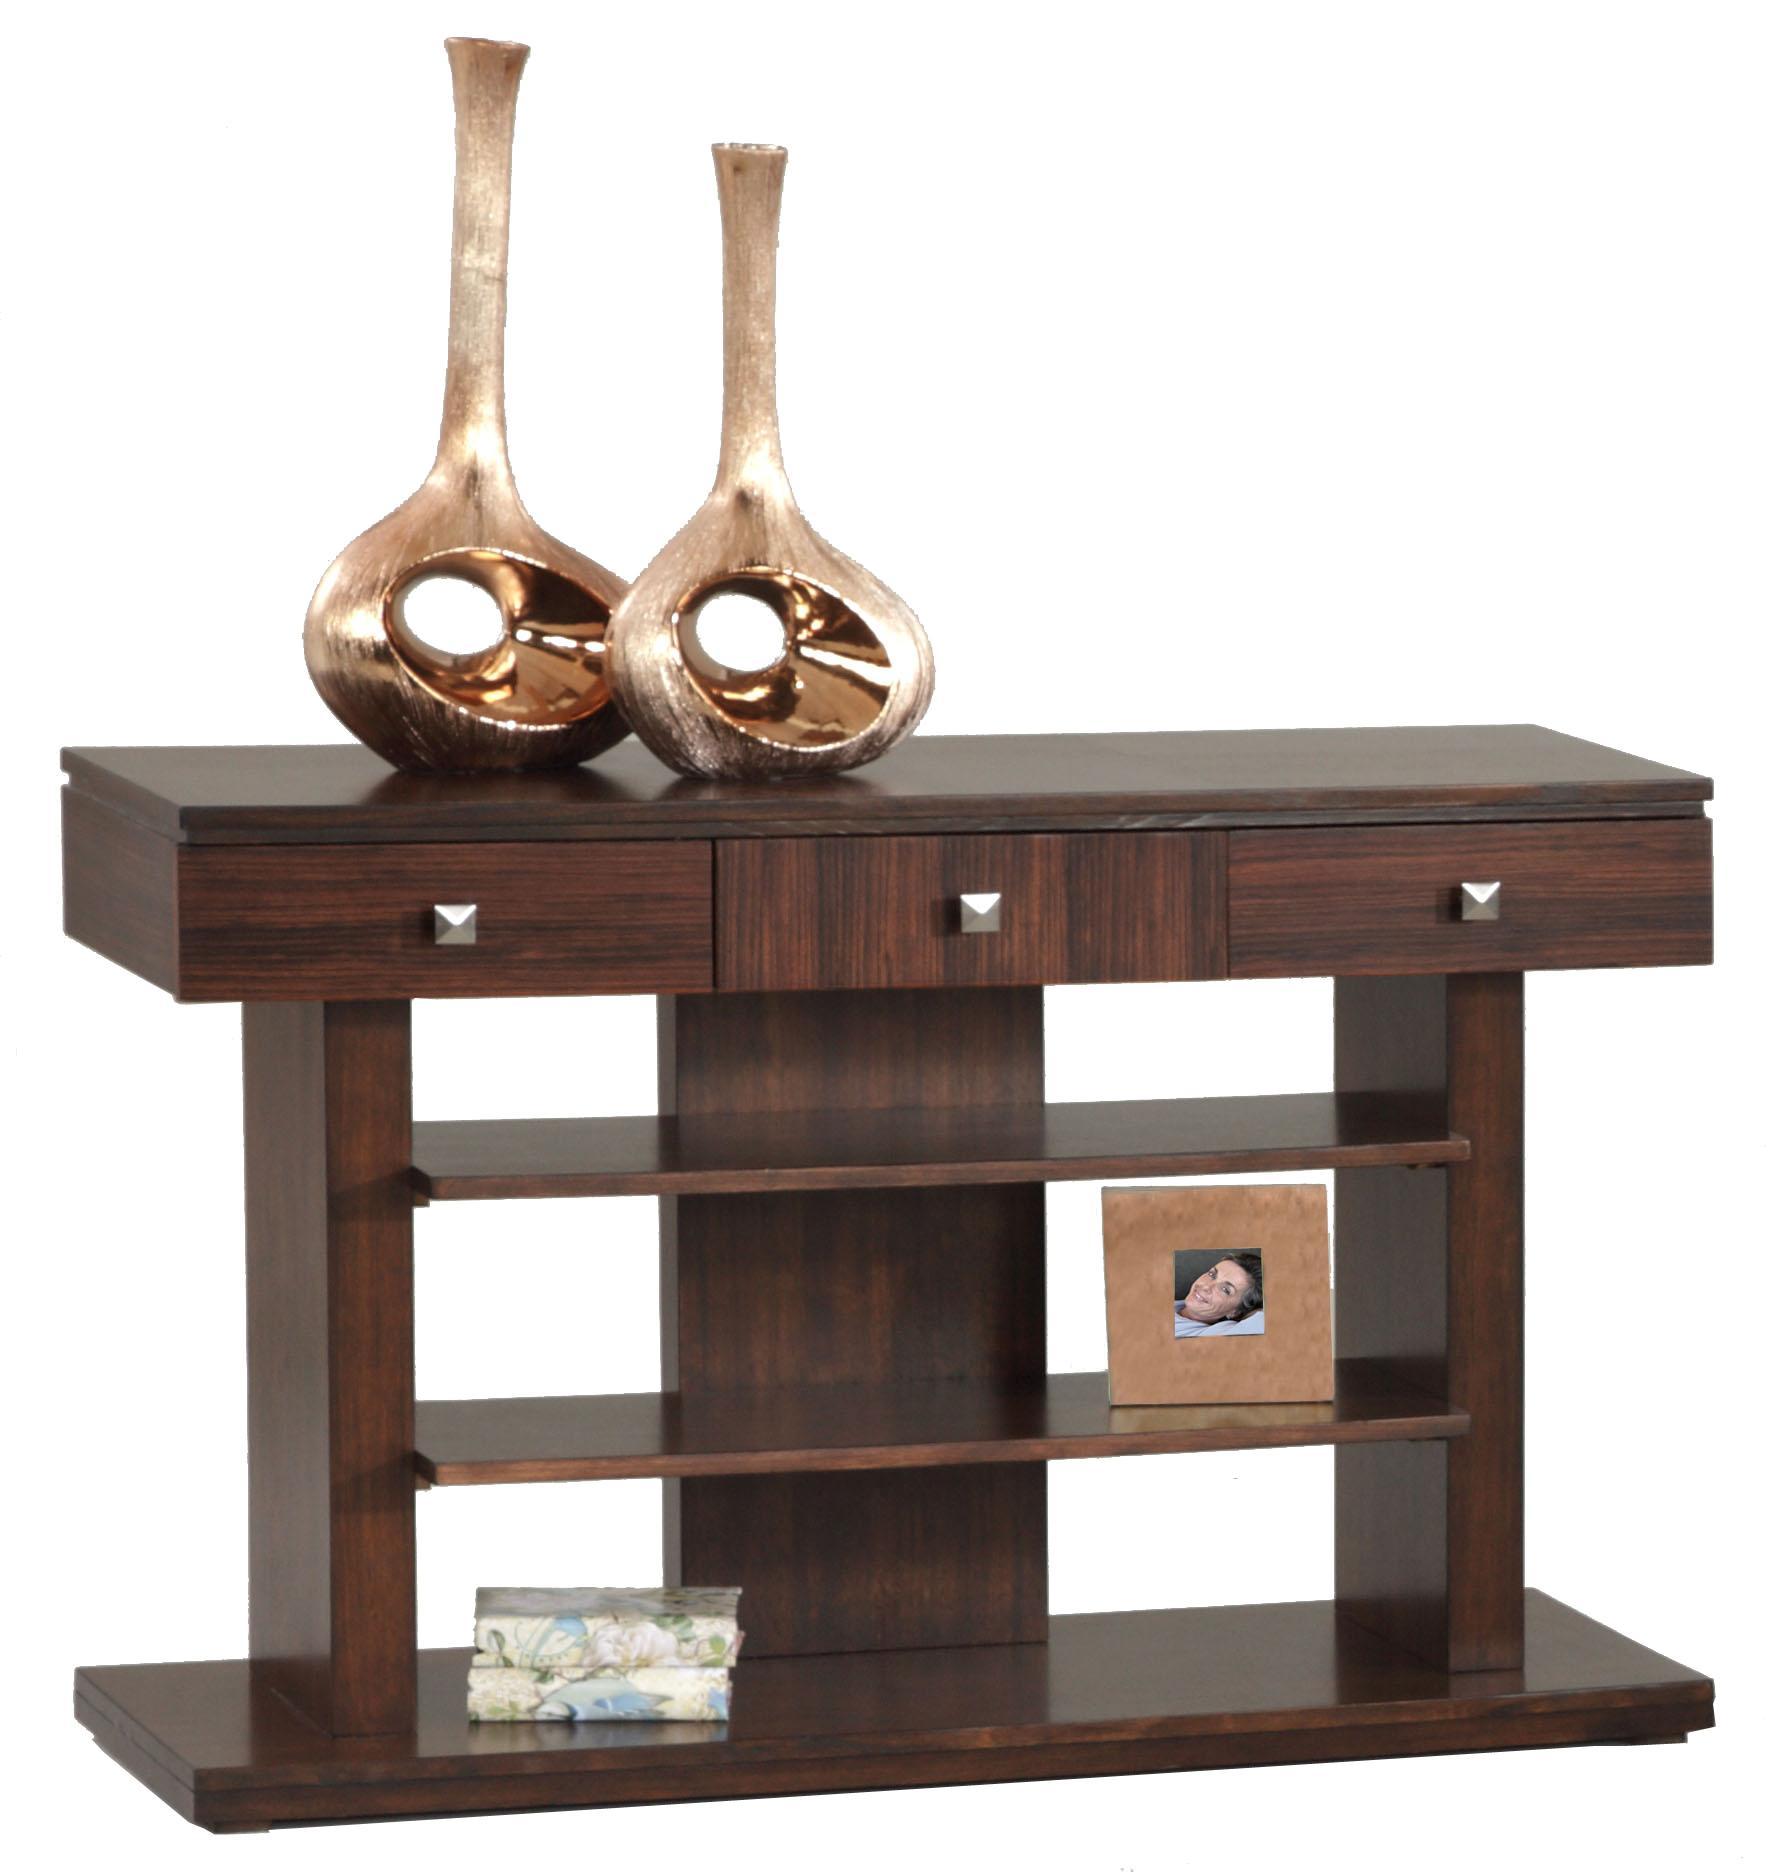 Progressive Furniture Le Mans Sofa/Console Table - Item Number: P561-05